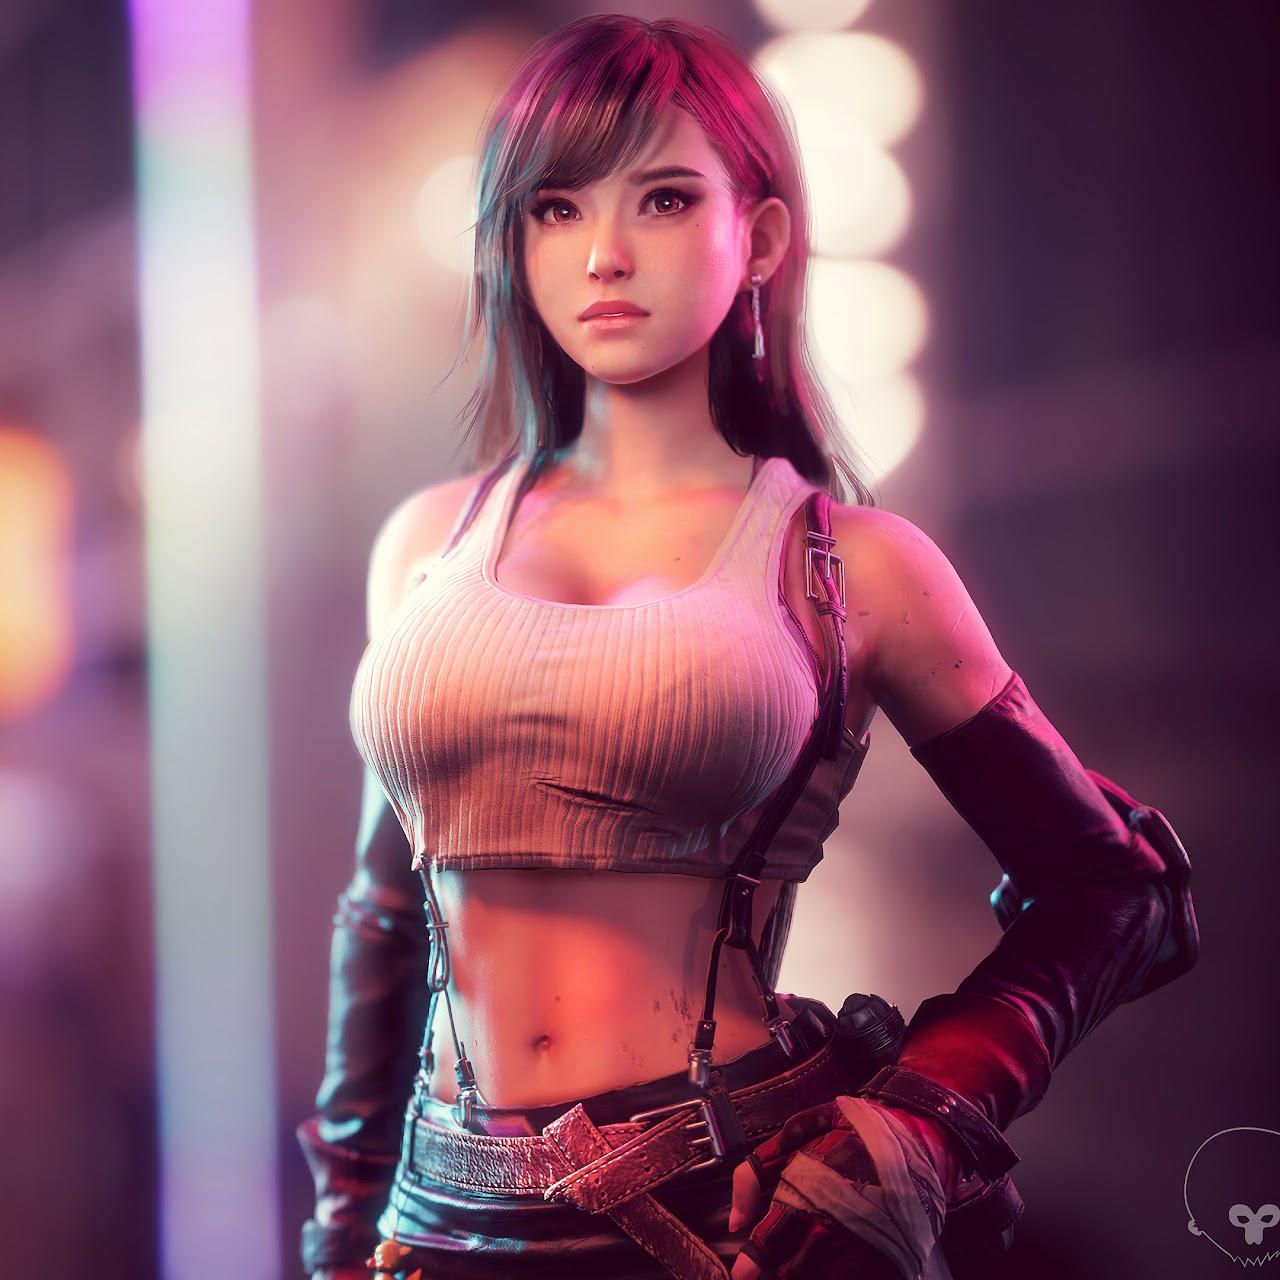 Tifa Lockhart, Final Fantasy 7 Remake, 4K, #9 Wallpaper